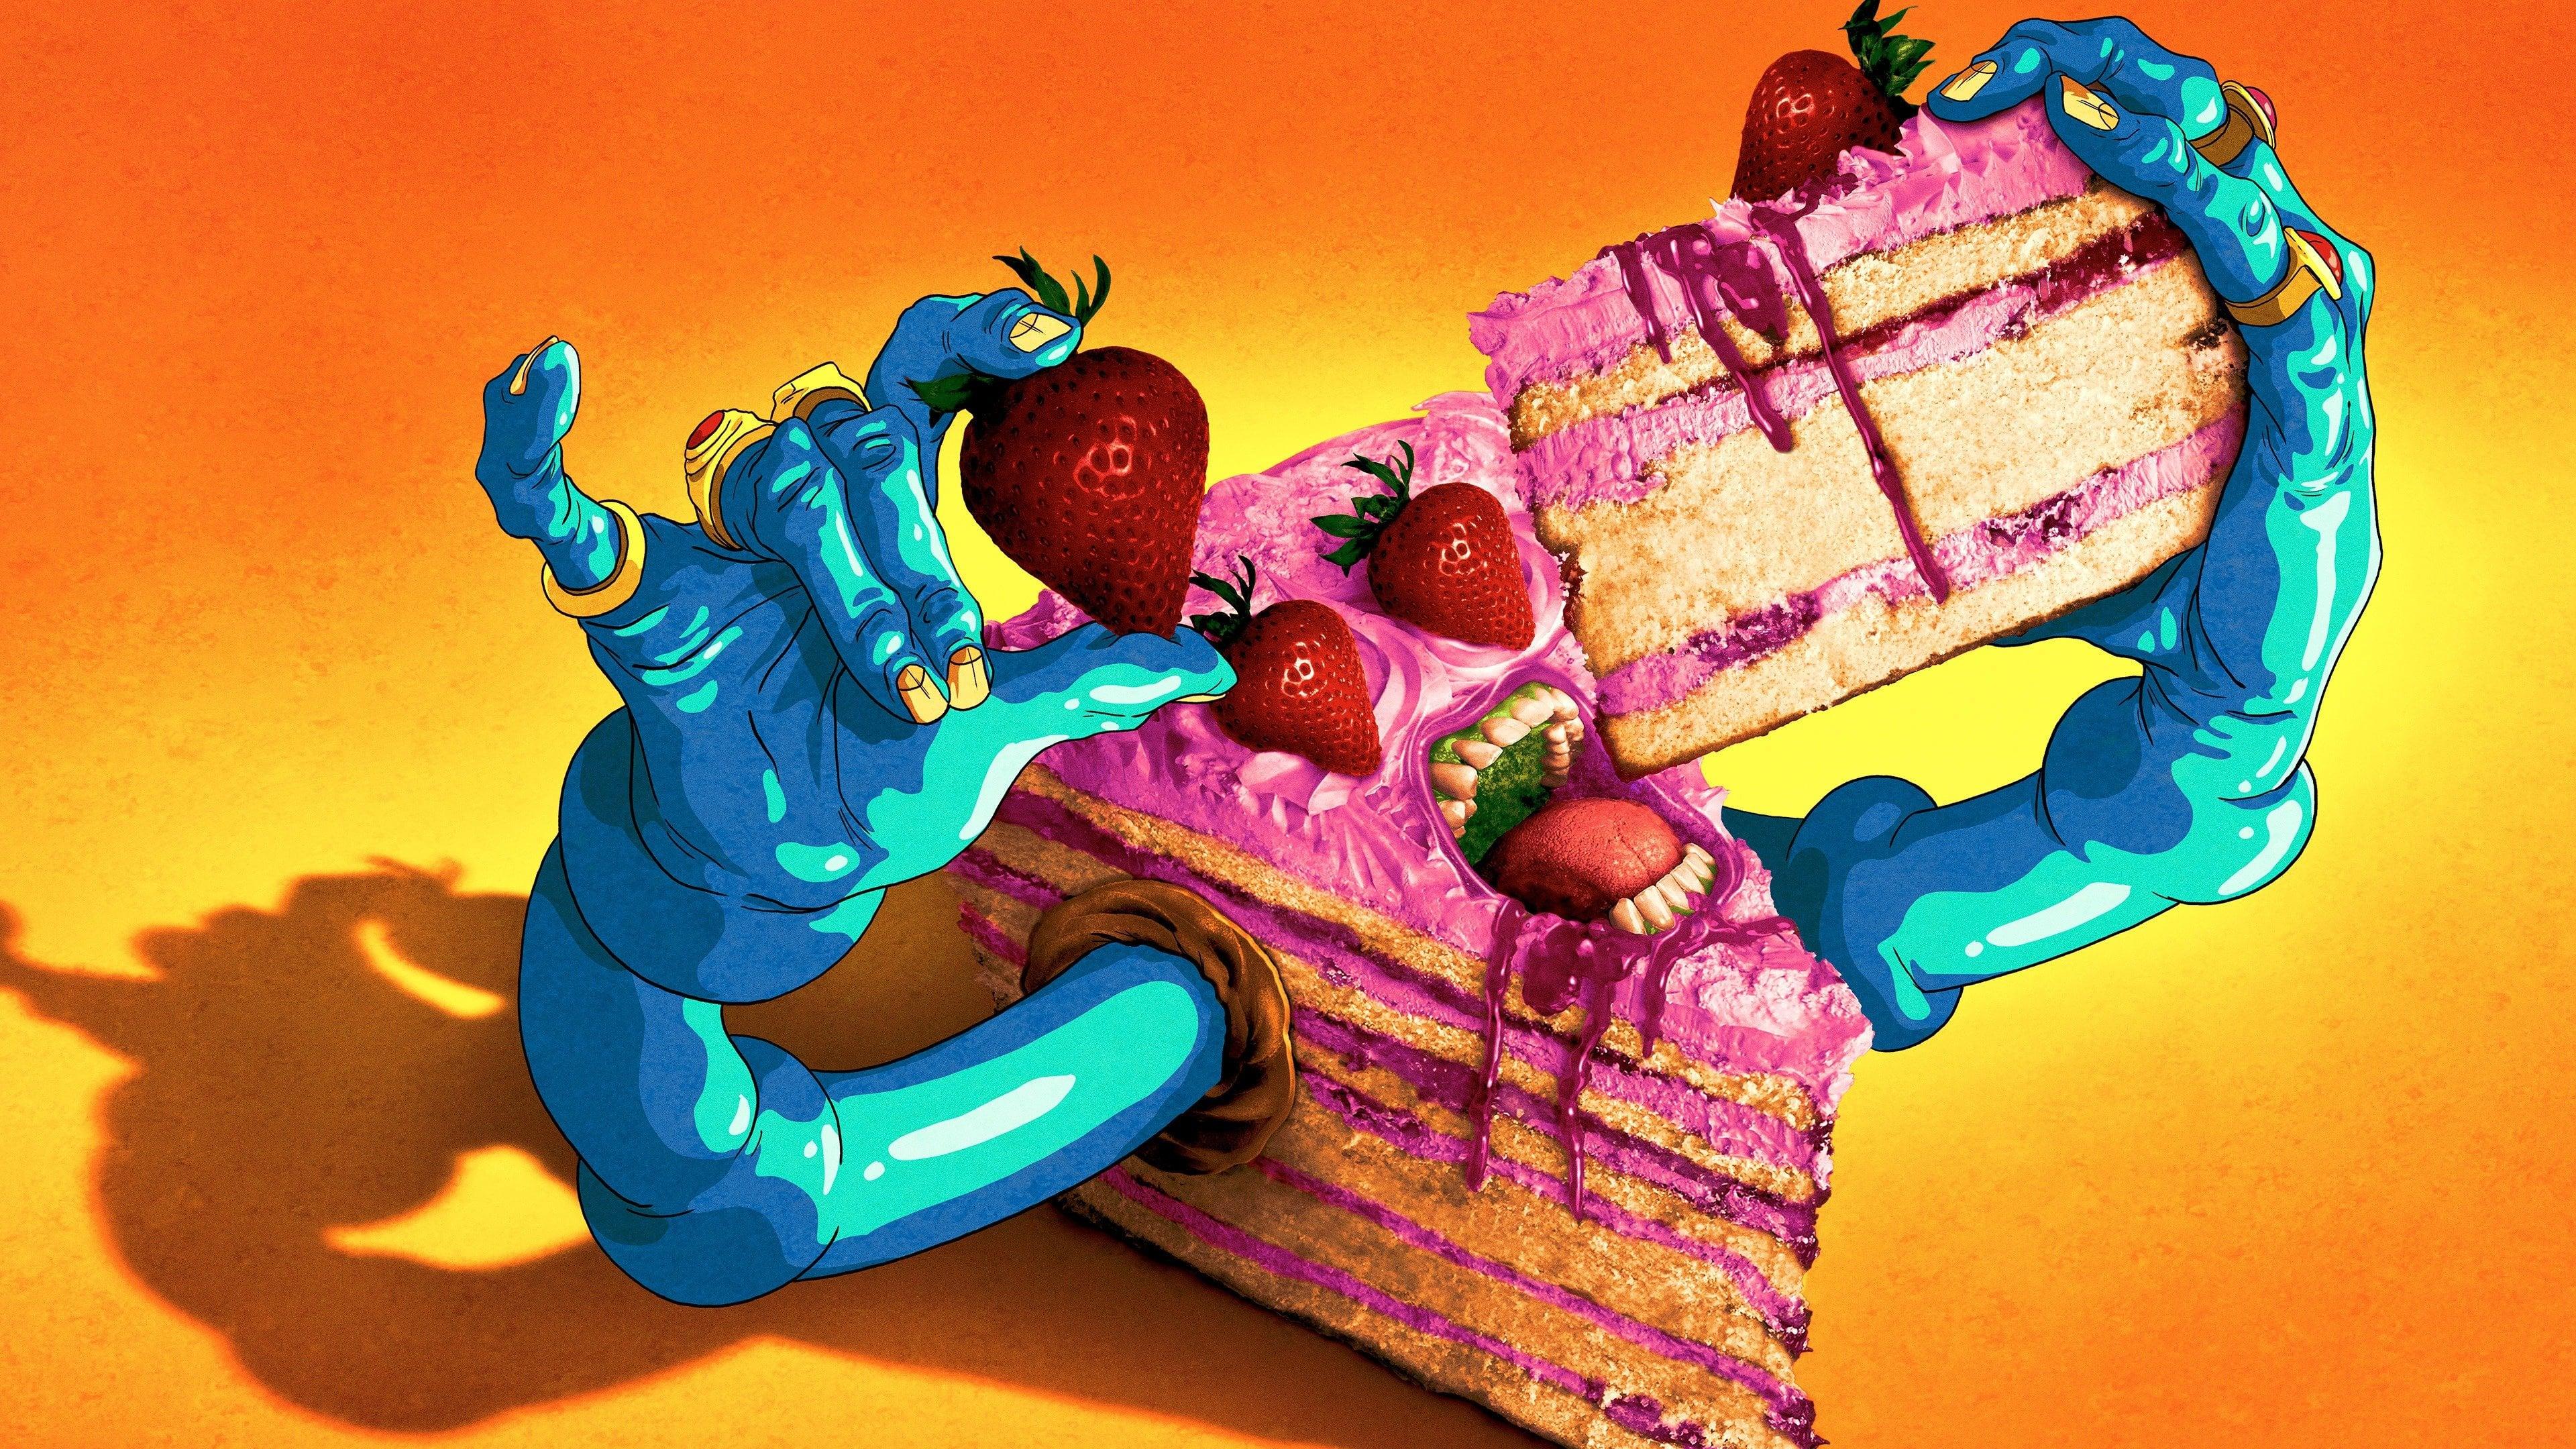 Cake Season 3 Episode 5